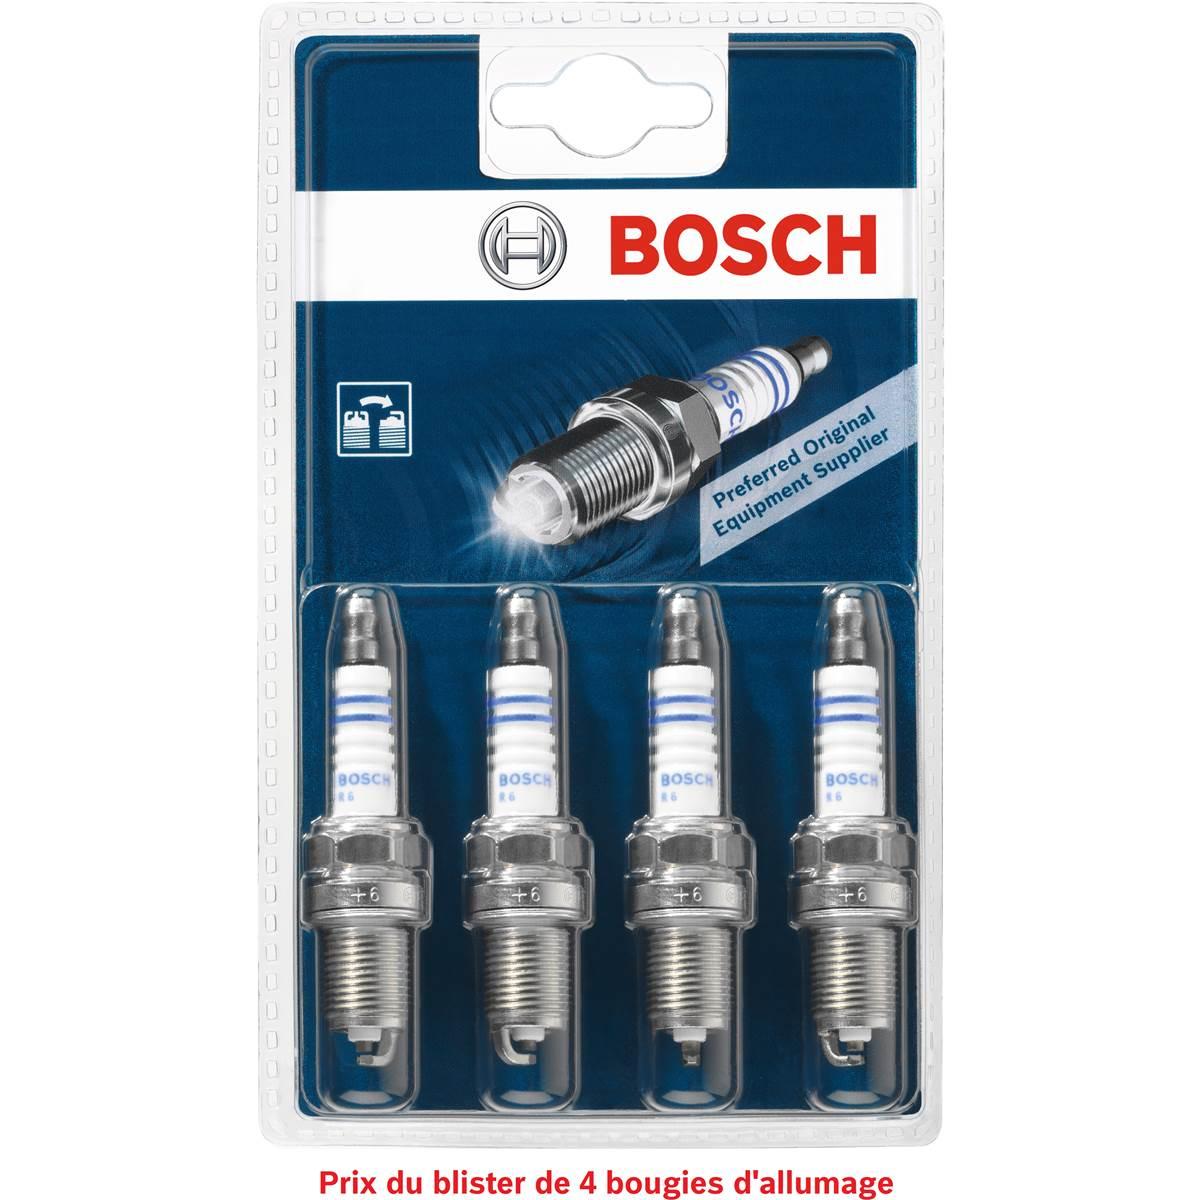 Bougies d'allumage Bosch N°3